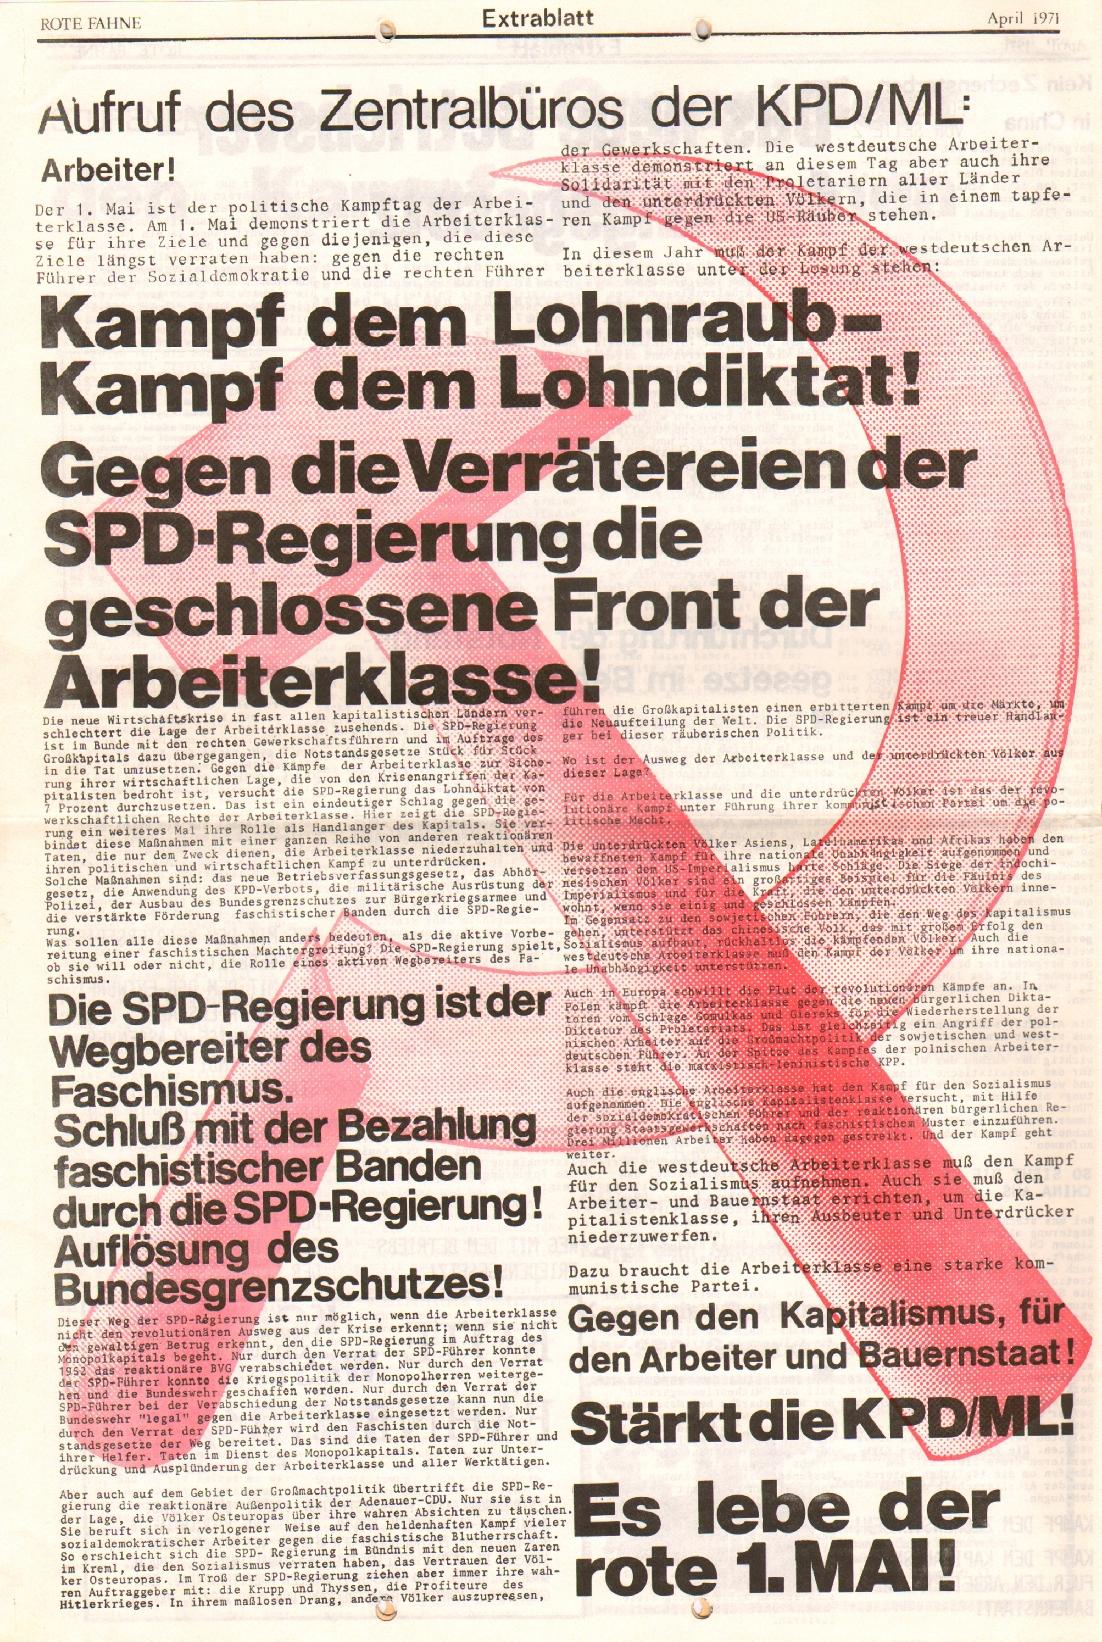 Rote Fahne, 2. Jg., April 1971, Extrablatt, Seite 6